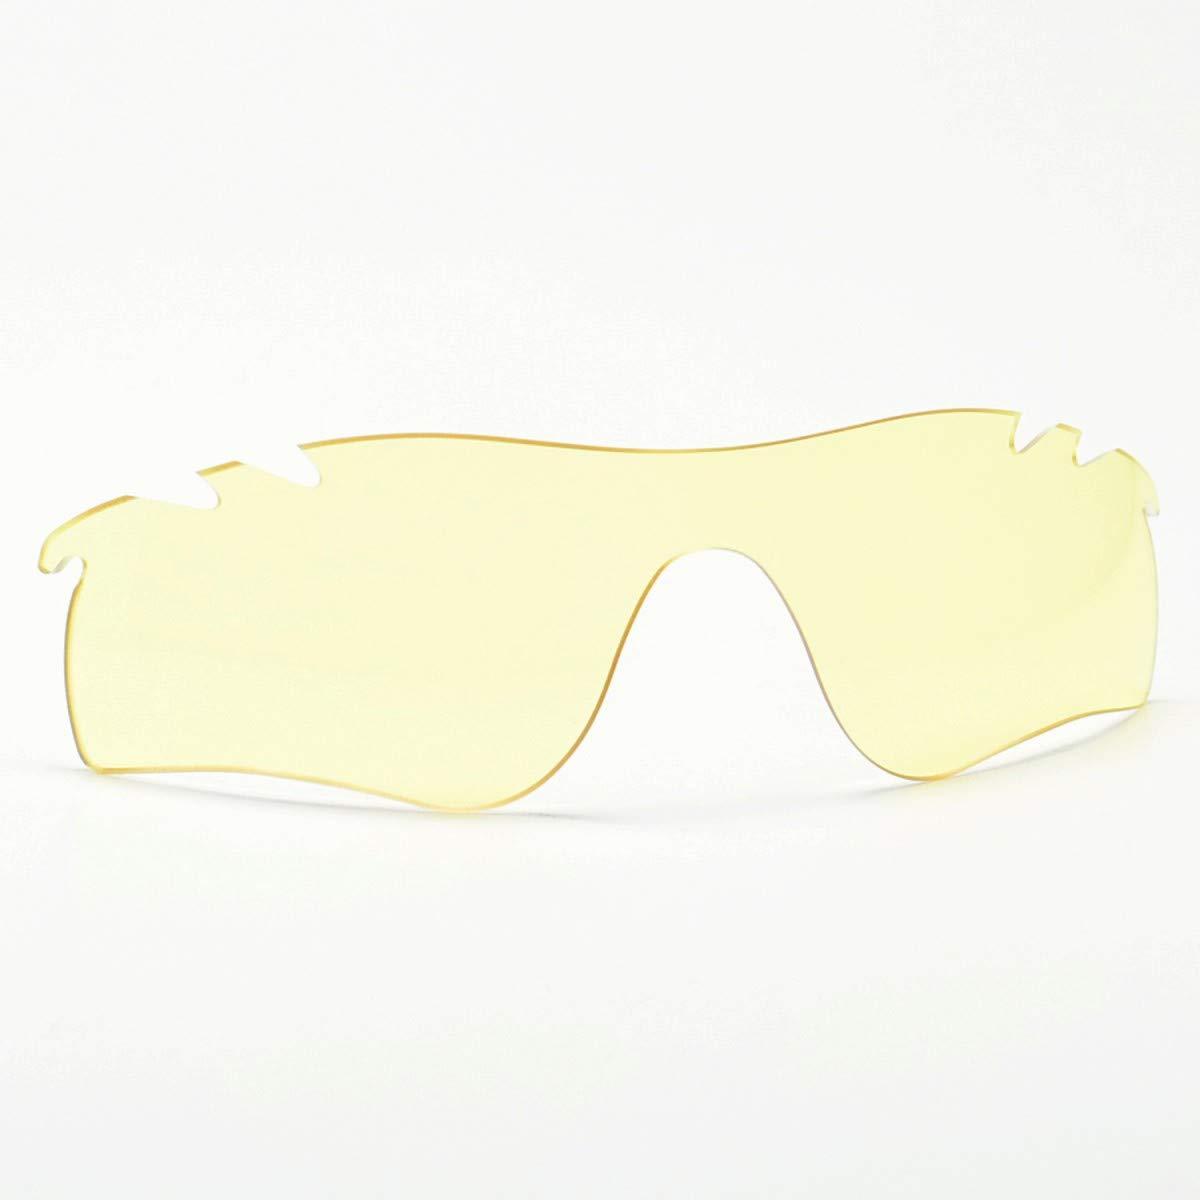 GOODMAN LENS MANUFACTURE グッドマンレンズマニュファクチュー OAKLEY RADARLOCK オークリー レーダーロック用交換レンズ ライトイエロー 偏光フィルム内蔵 ※レンズのみ   B07NJF2PVS